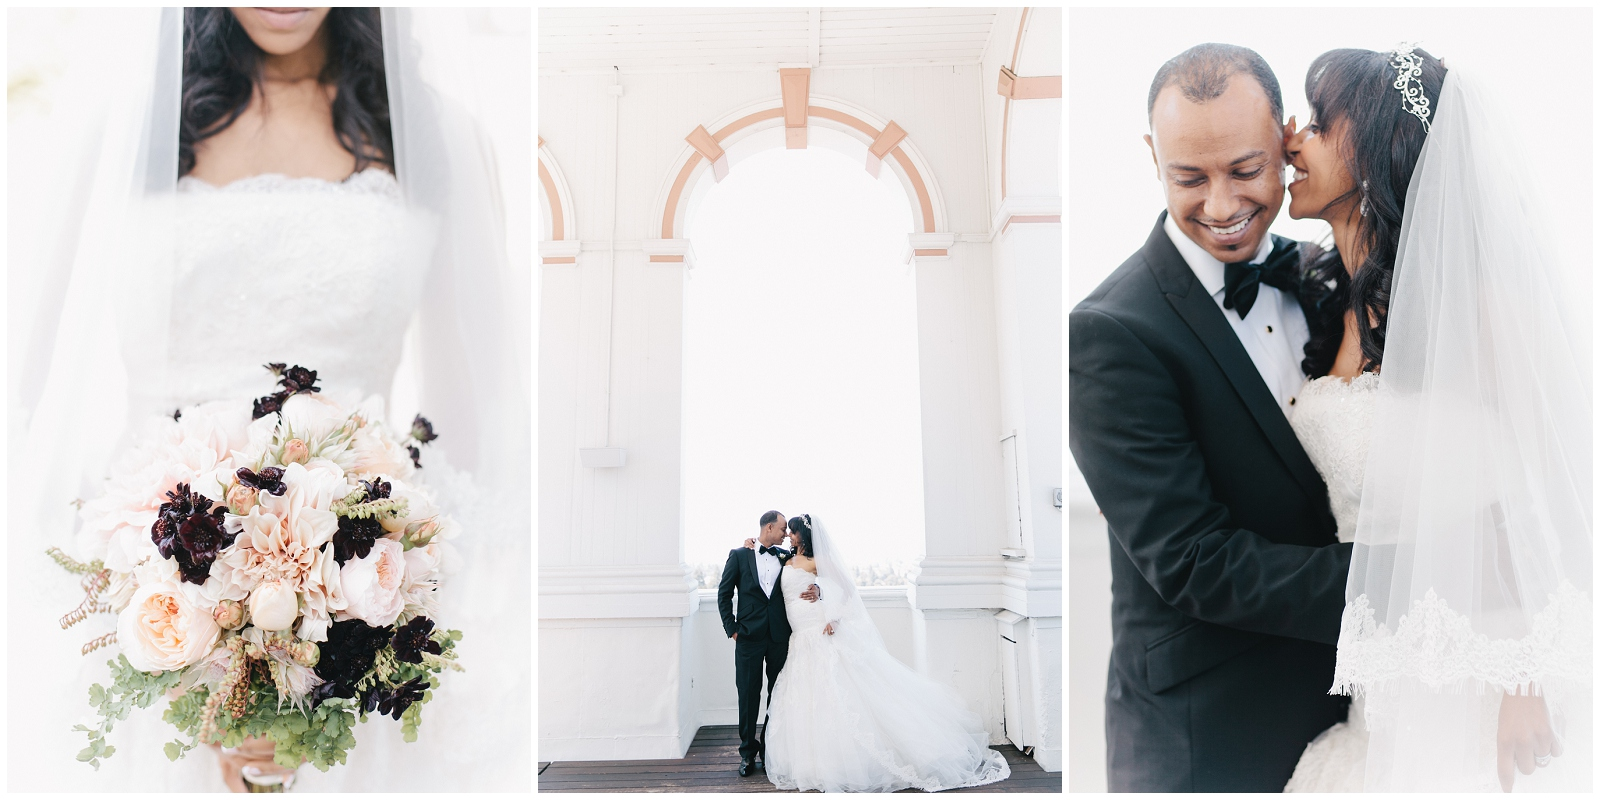 San-Francisco-Bay-Area-Wedding-Photography-Claremont-Hotel-1.jpg